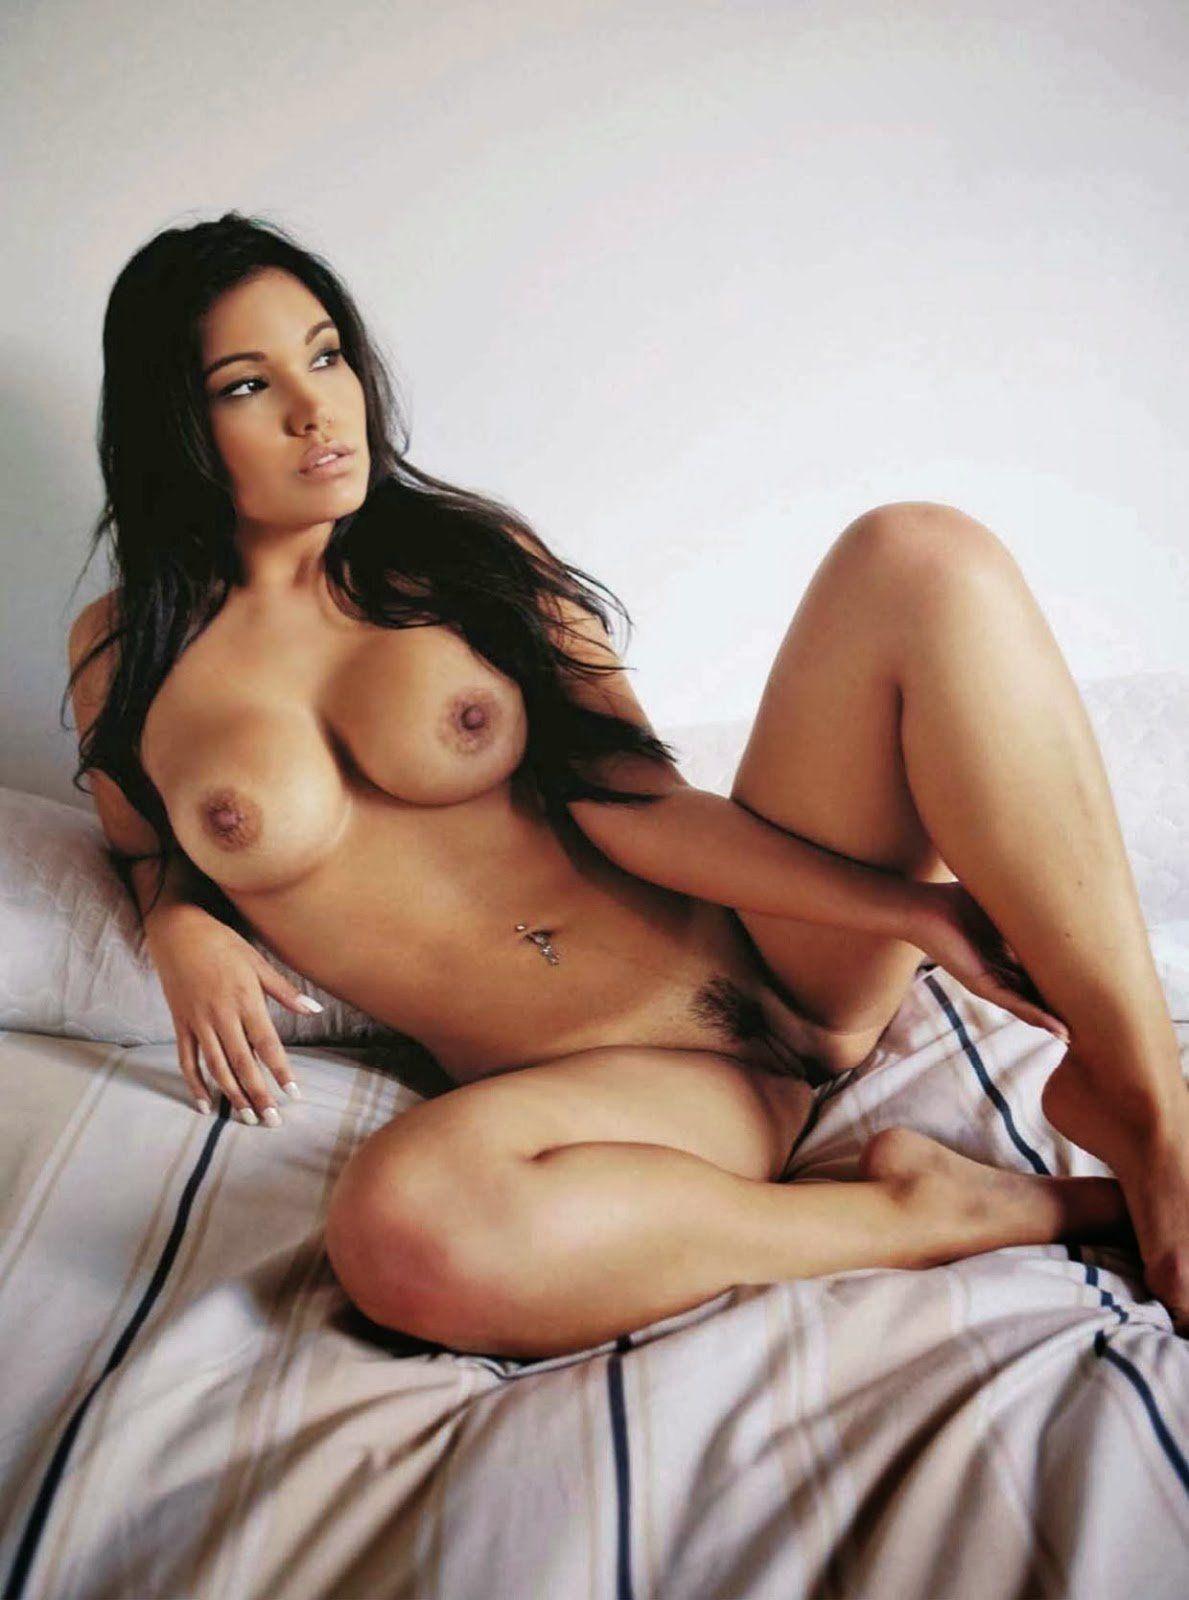 FRIEDA: Sexy naked brazilian models